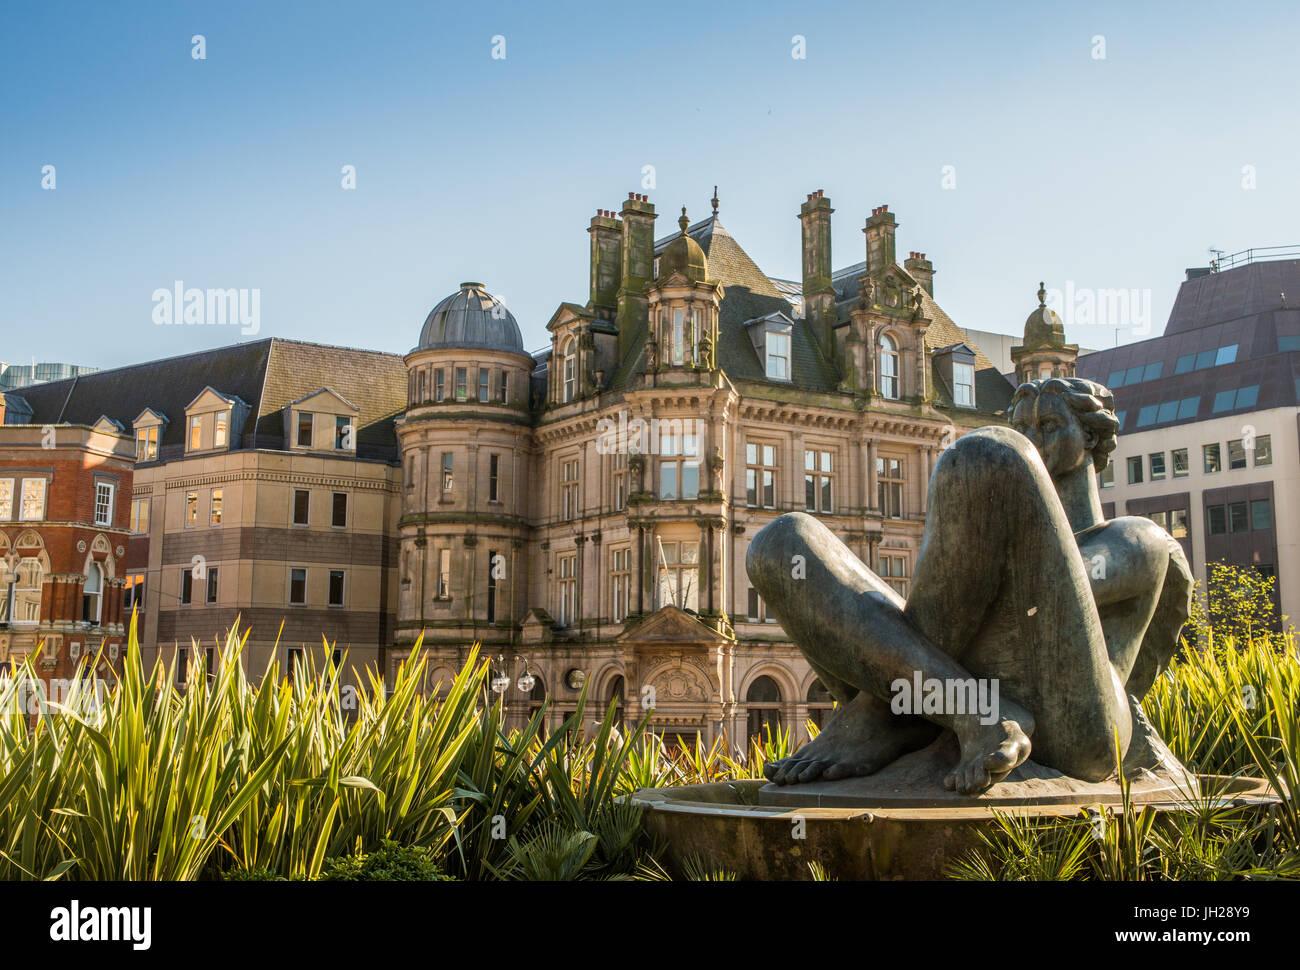 Victoria Square, una plaza peatonal en Birmingham, Inglaterra, Reino Unido, Europa Imagen De Stock